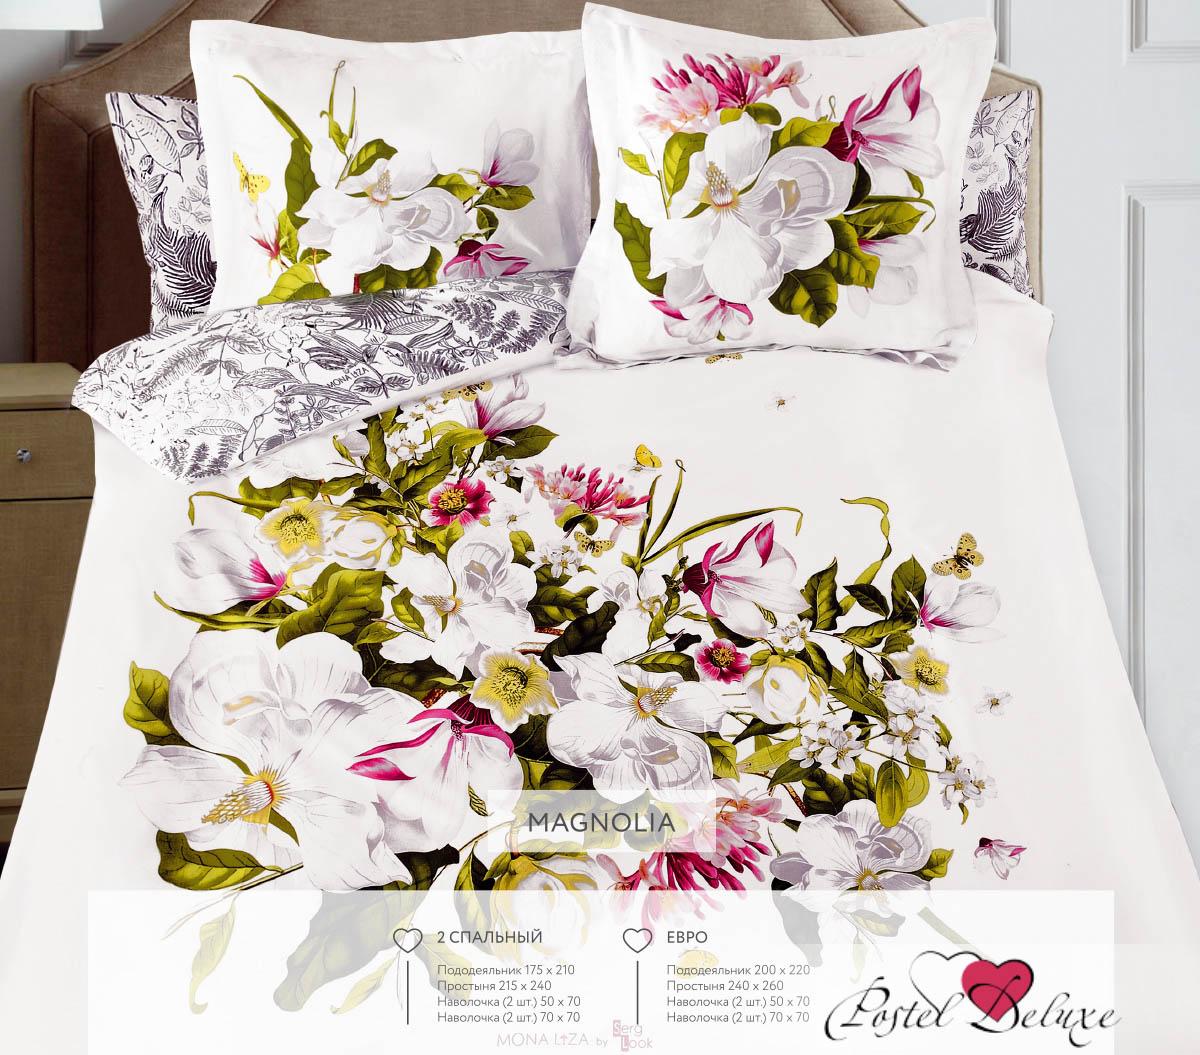 Постельное белье Mona Liza Постельное белье Magnolia (2 сп. евро) комплект пб 2 сп mona liza сатин жаккард royal 4 нав 2шт 70х70 и 2 шт